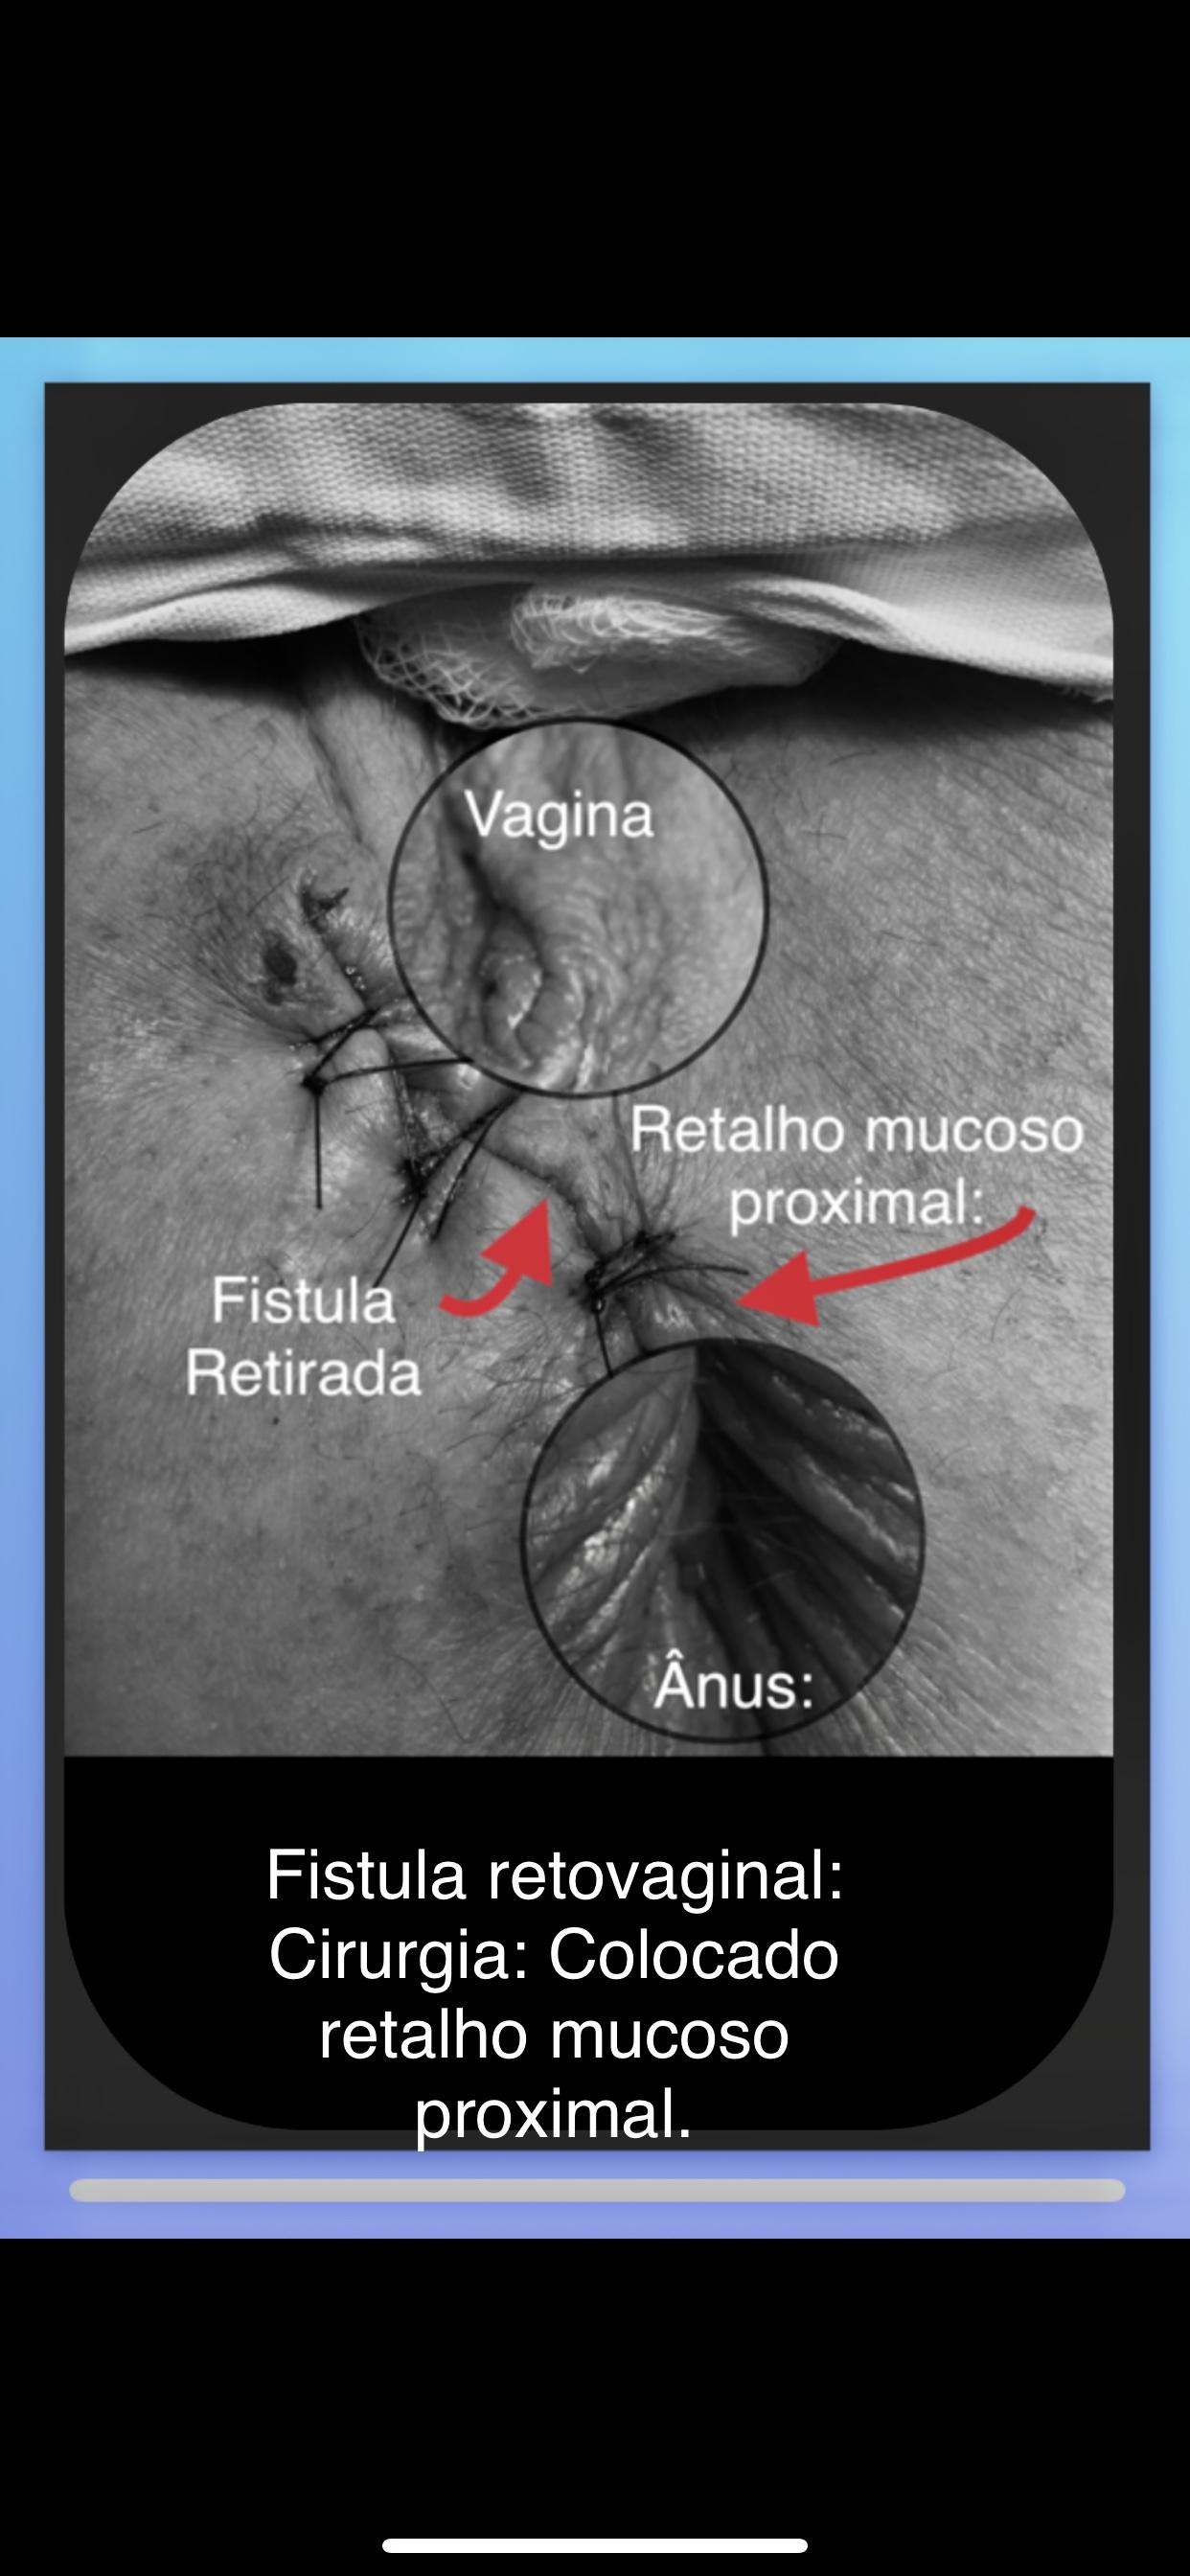 Fistula perianal retovaginal tratamento com retalho mucoso